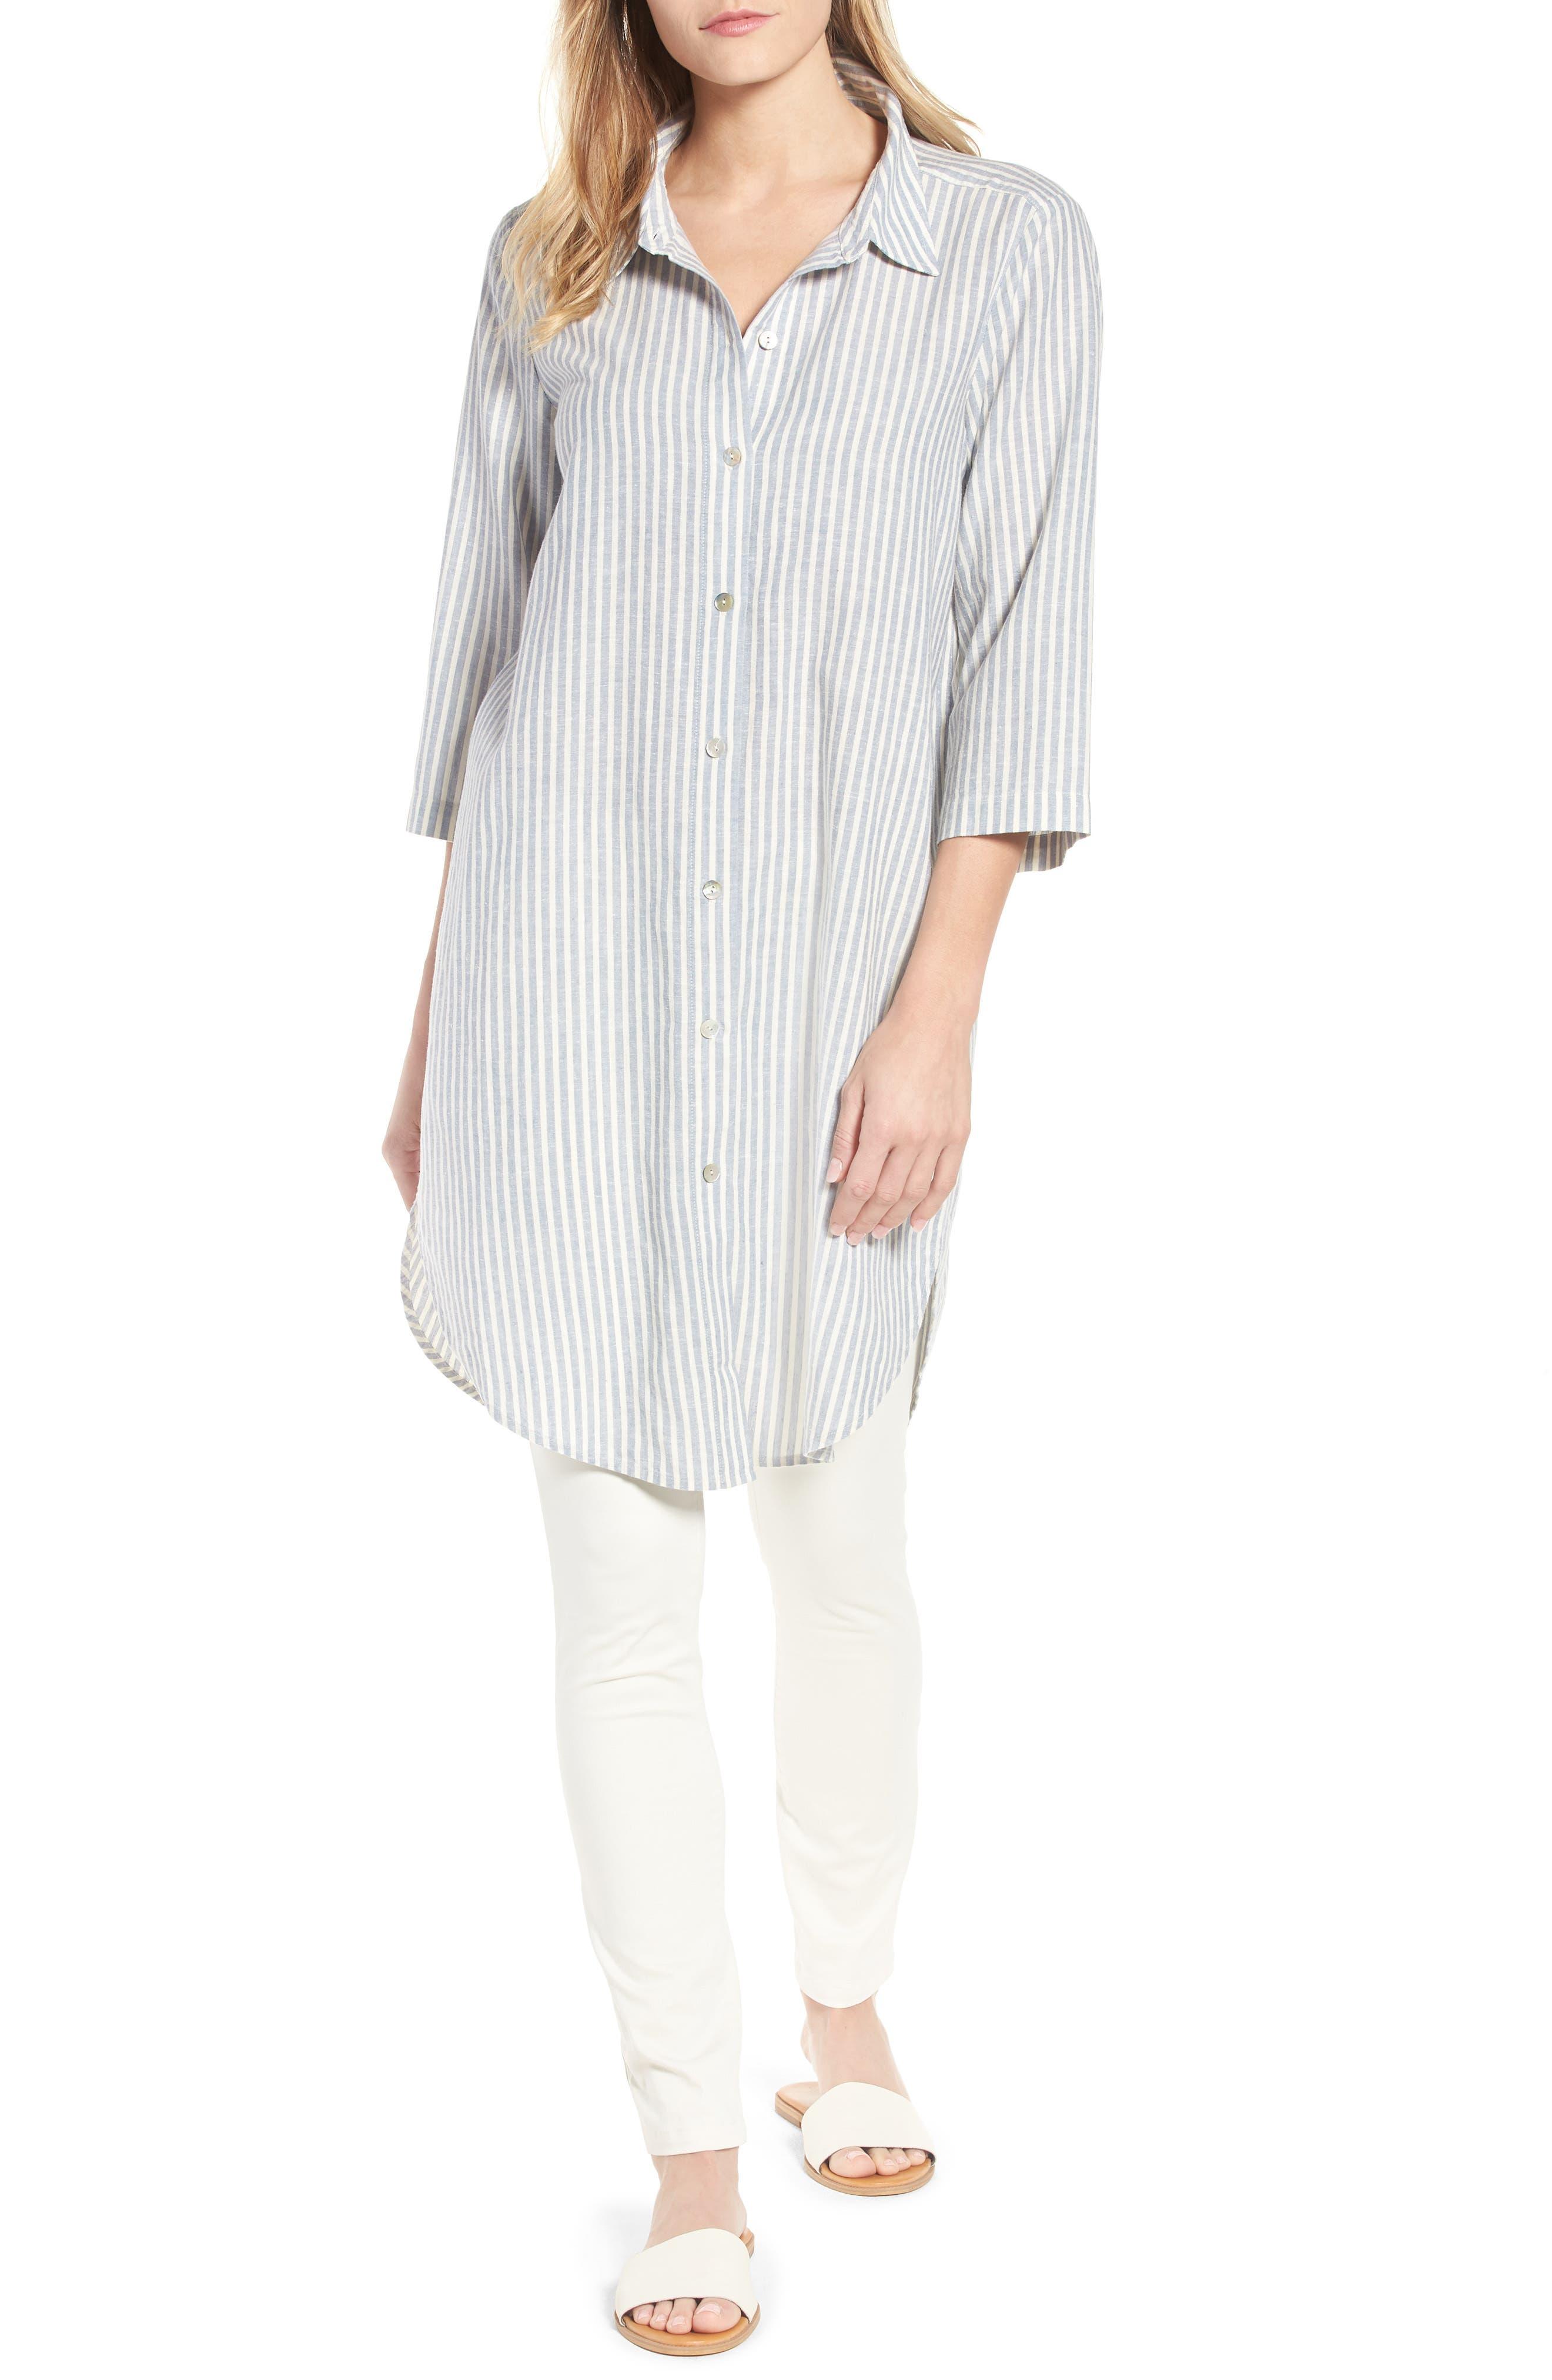 Eileen Fisher Stripe Tunic Top (Regular & Petite)